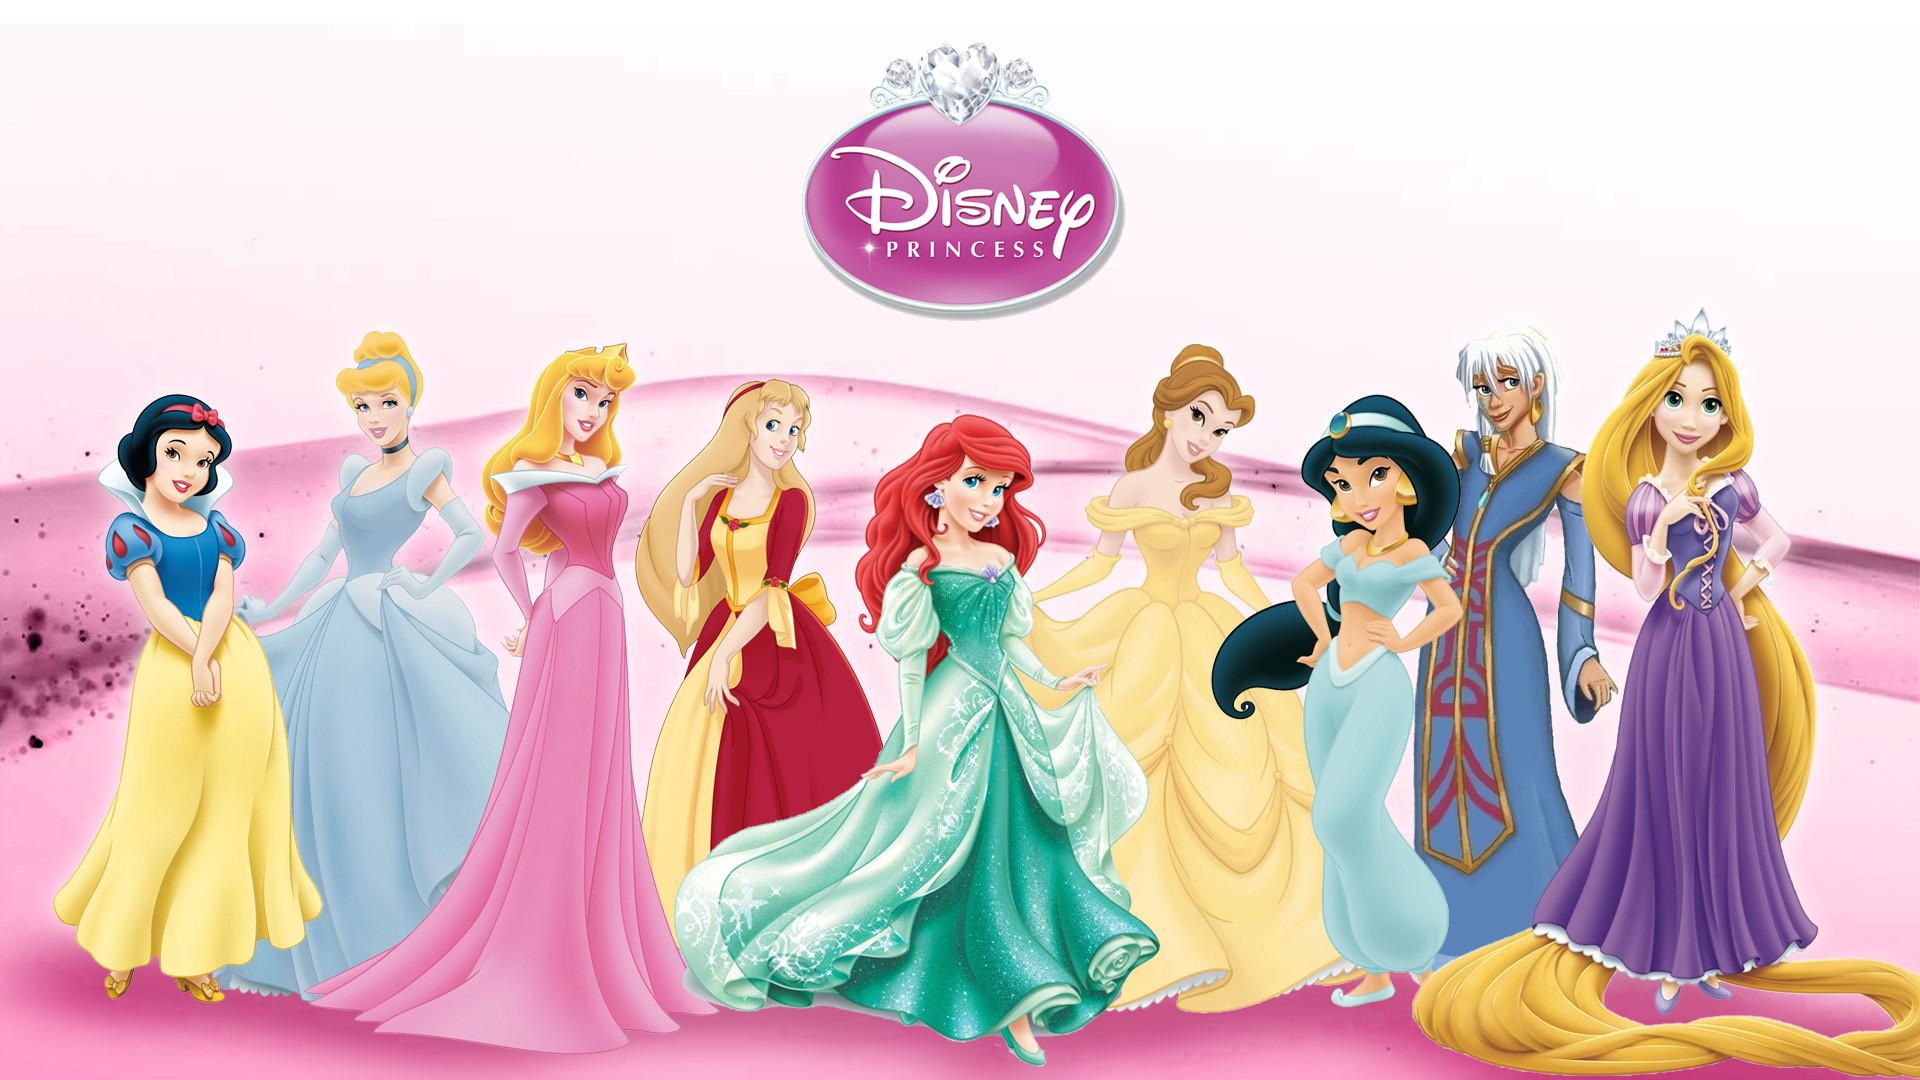 Princess aurora wallpaper 58 images - Images princesse ...